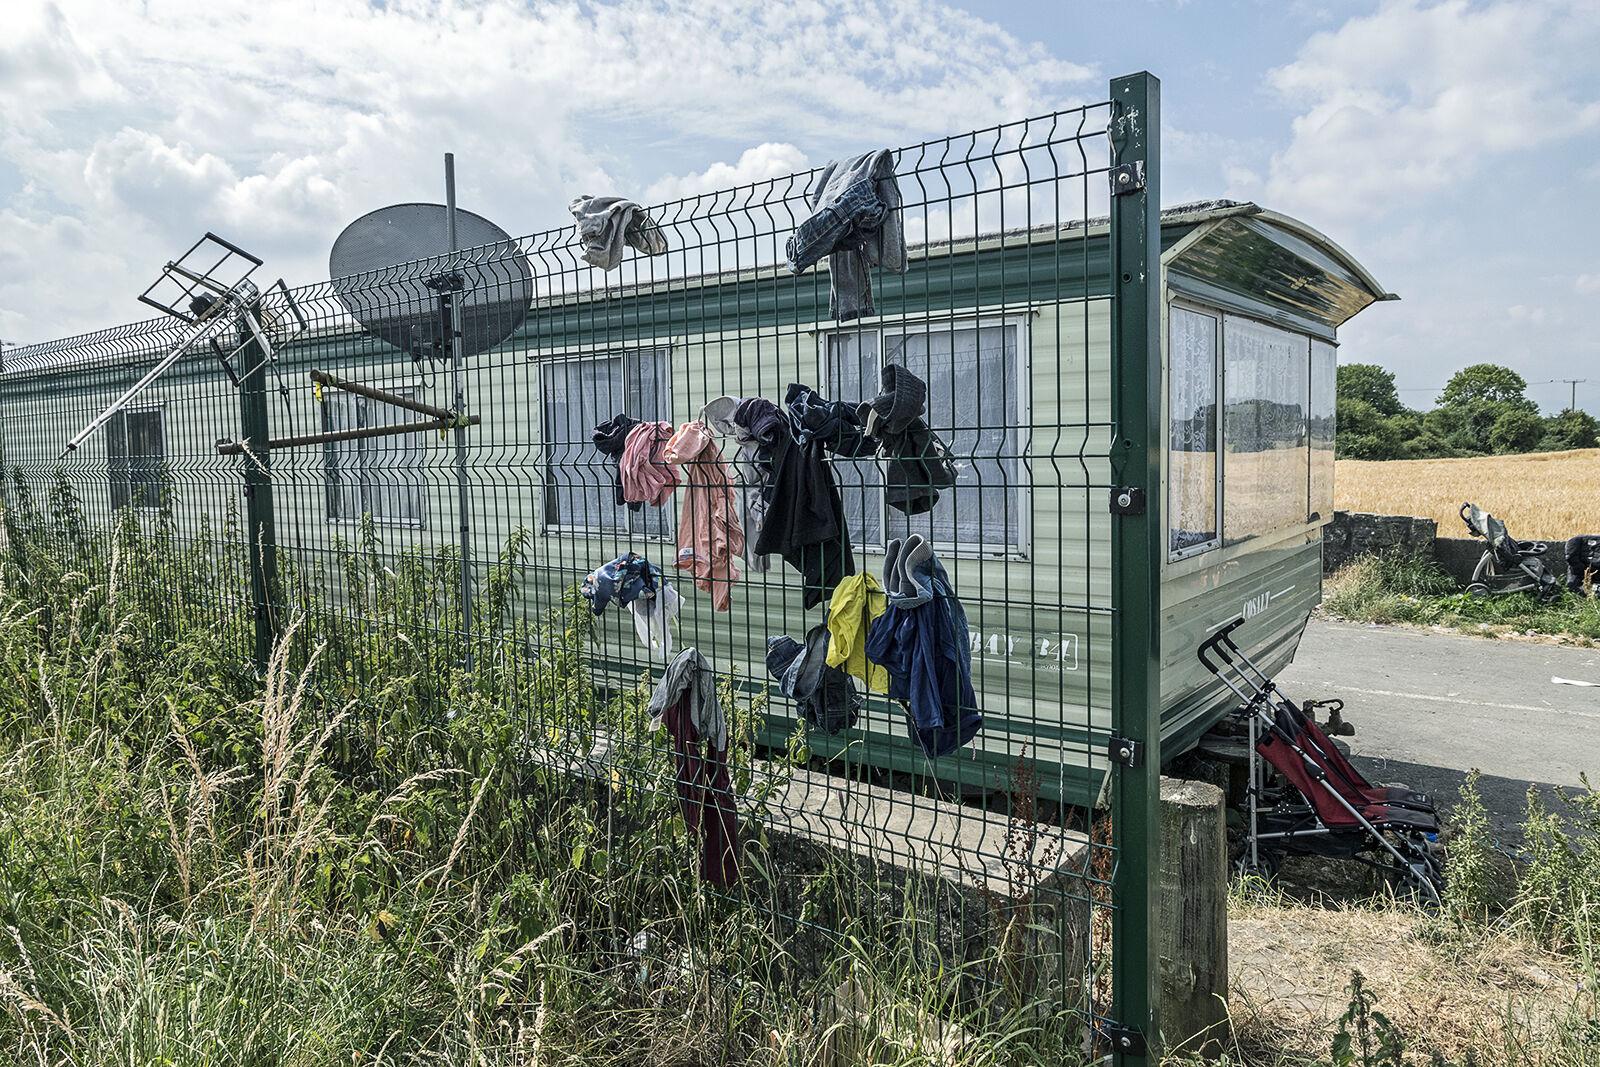 Reilly's Clothline, Tipperary, Ireland 2018